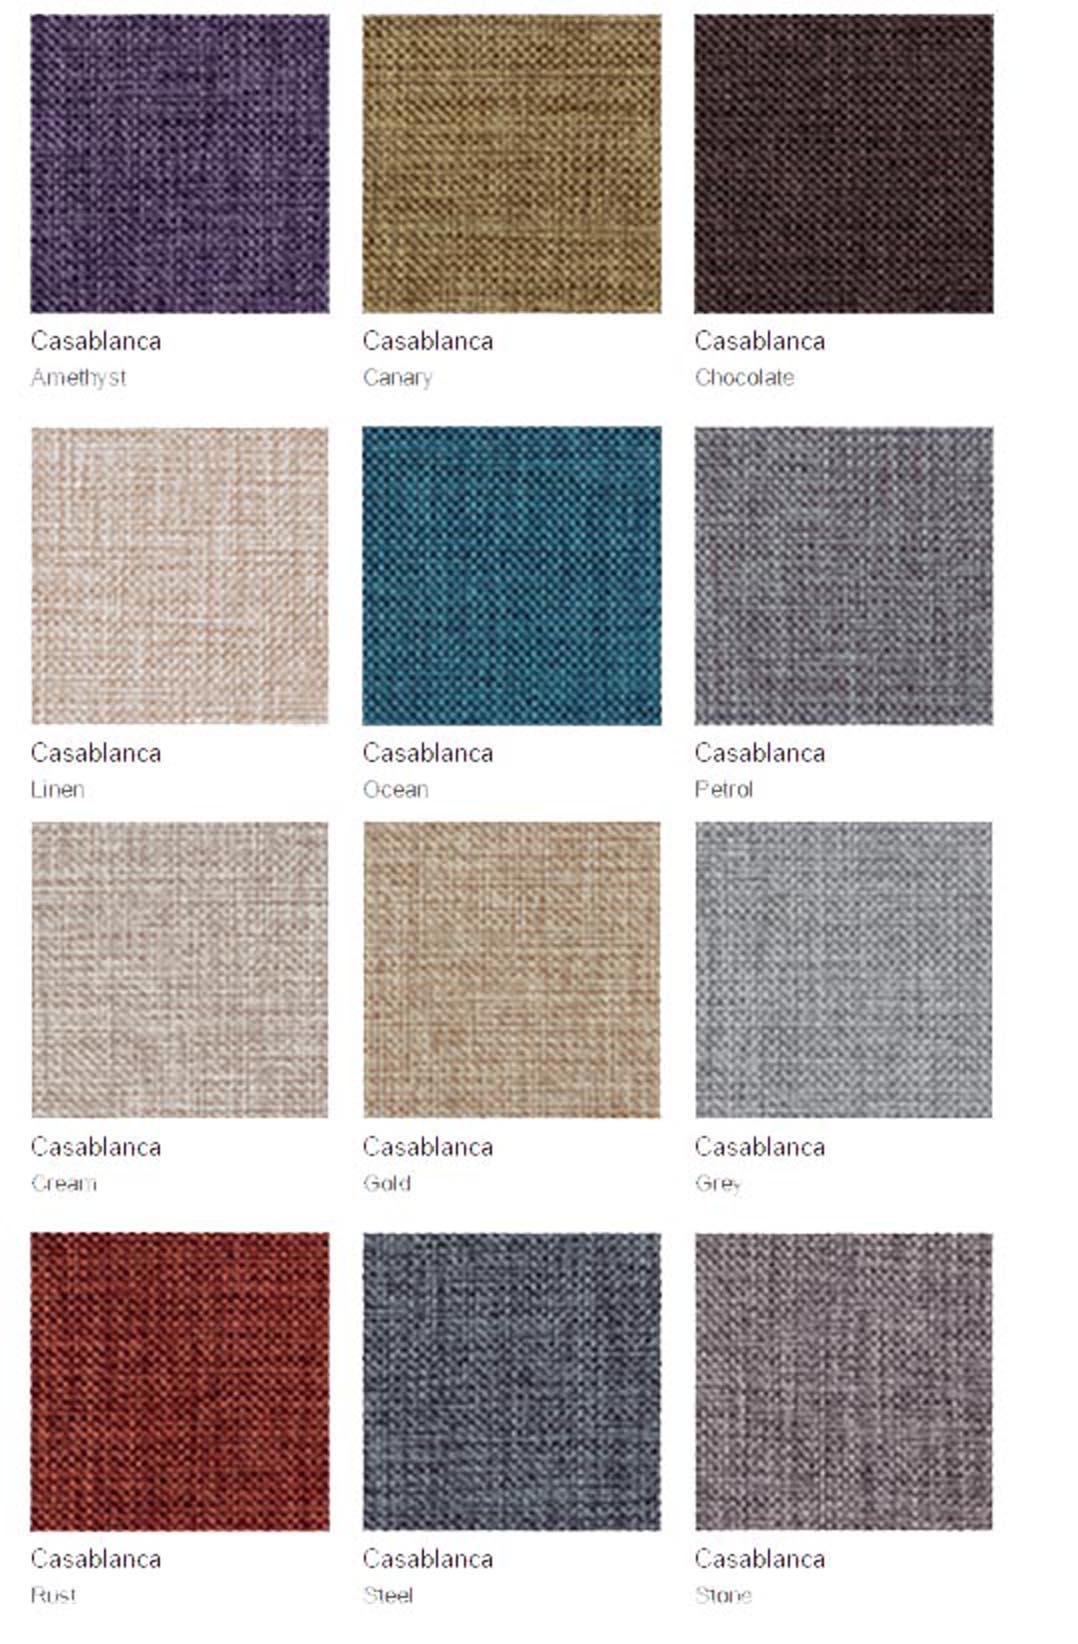 Casablanca Blackout Curtain Fabric Direct Fabrics